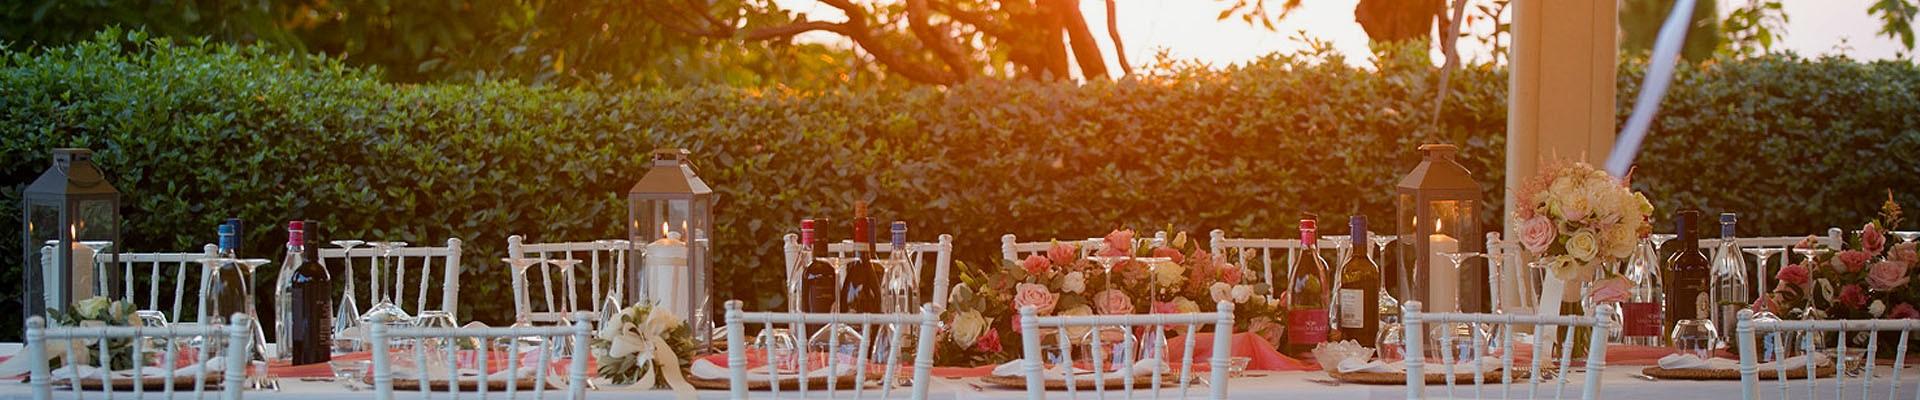 Bröllop i Toscana i Italien